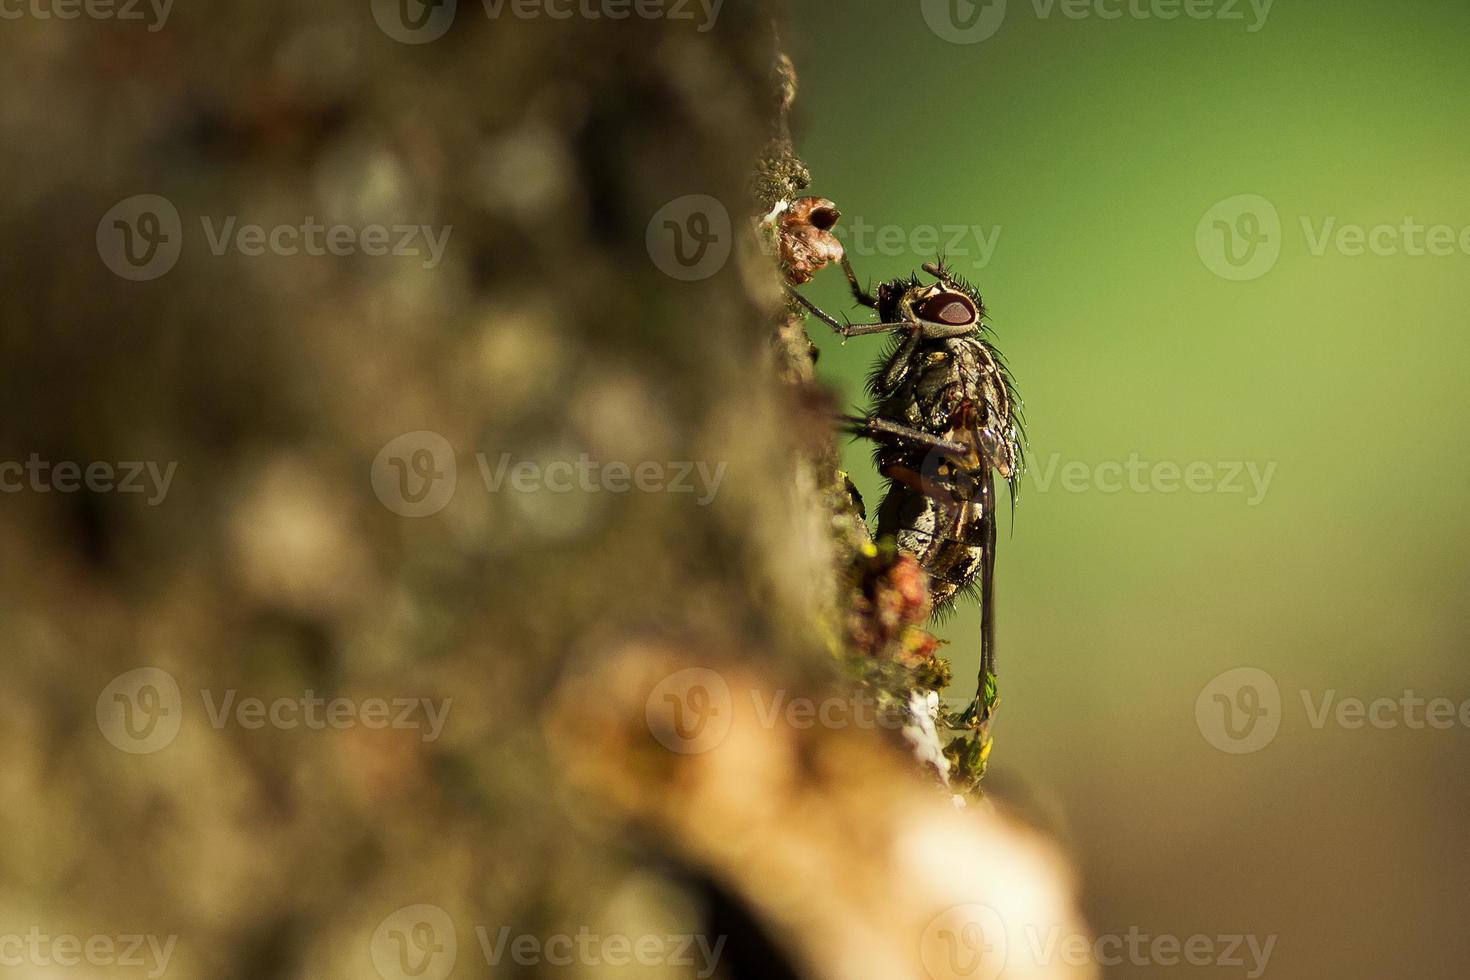 voar na árvore foto